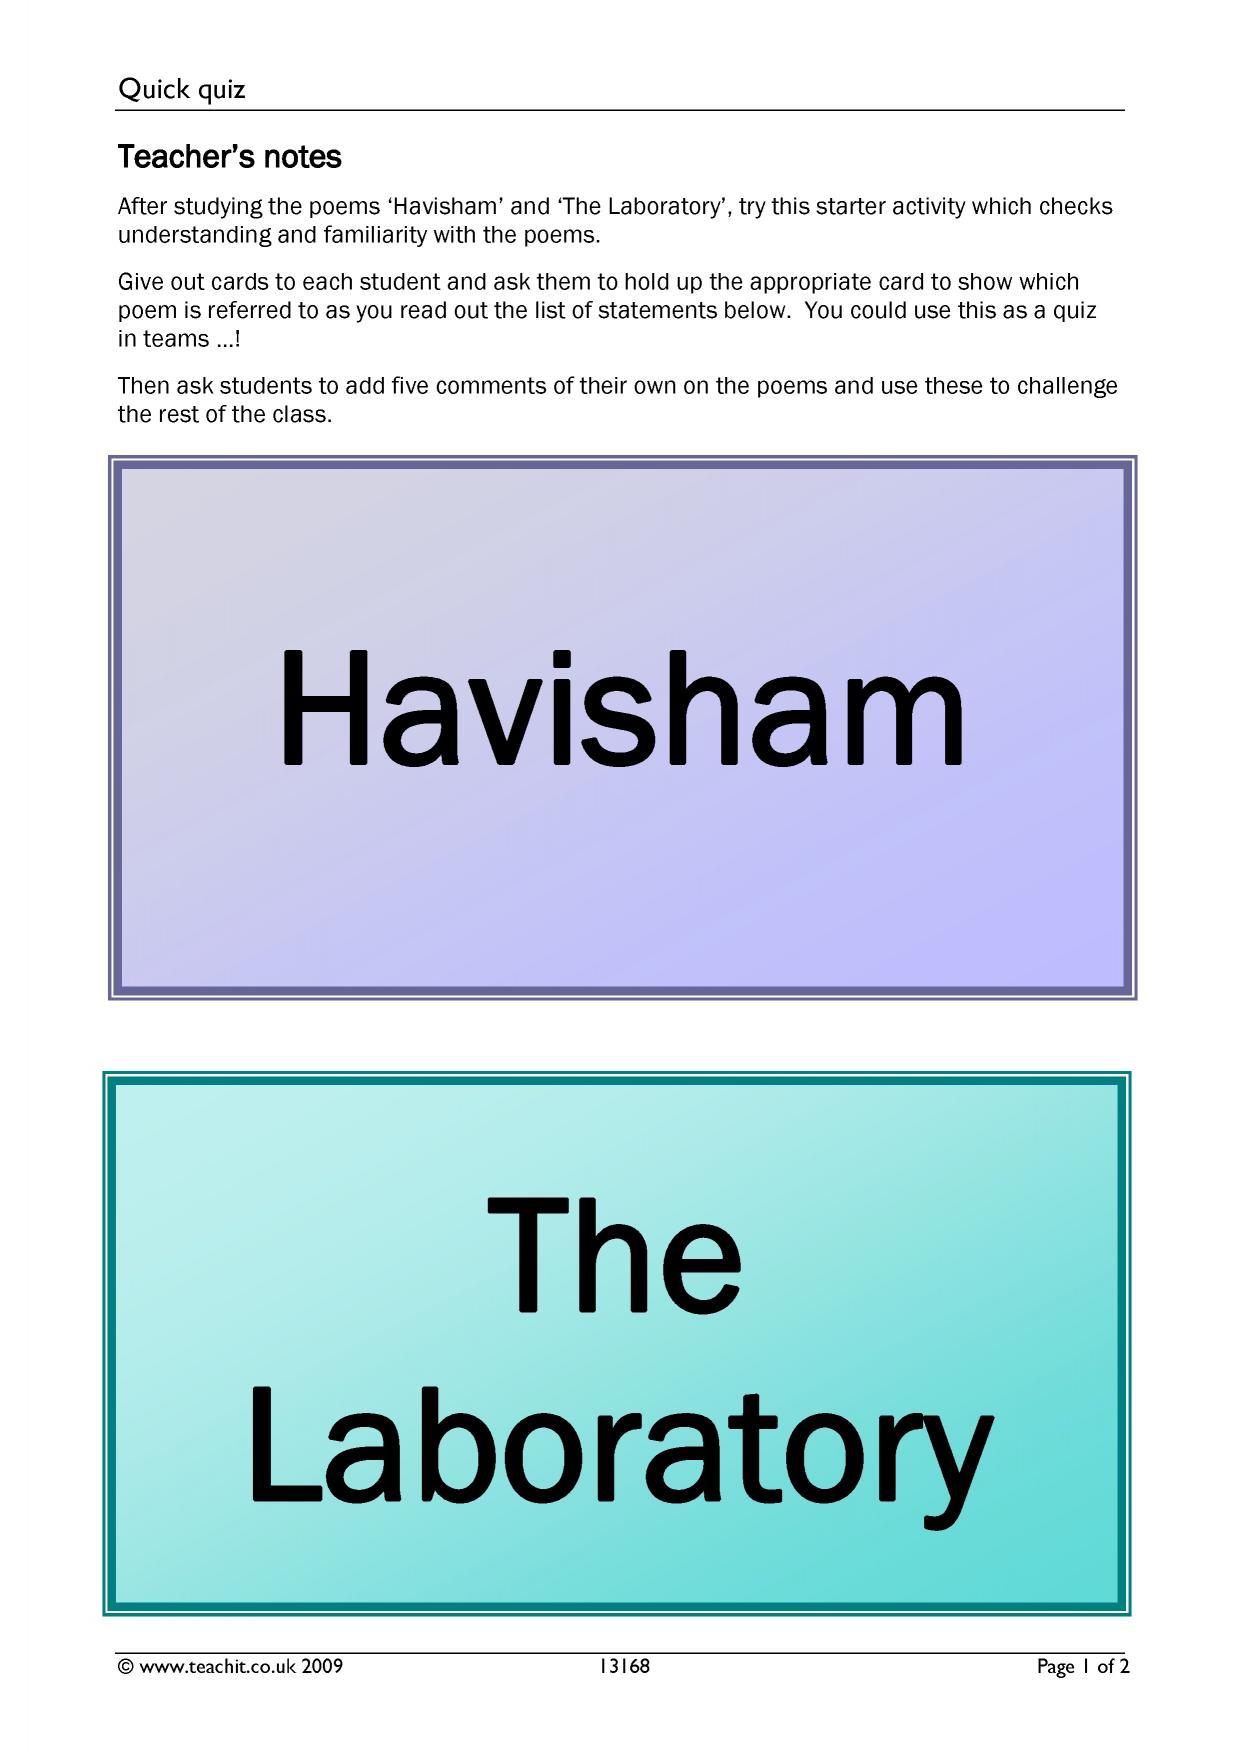 How Love is presented in Carol Ann Duffy's 'Havisham'